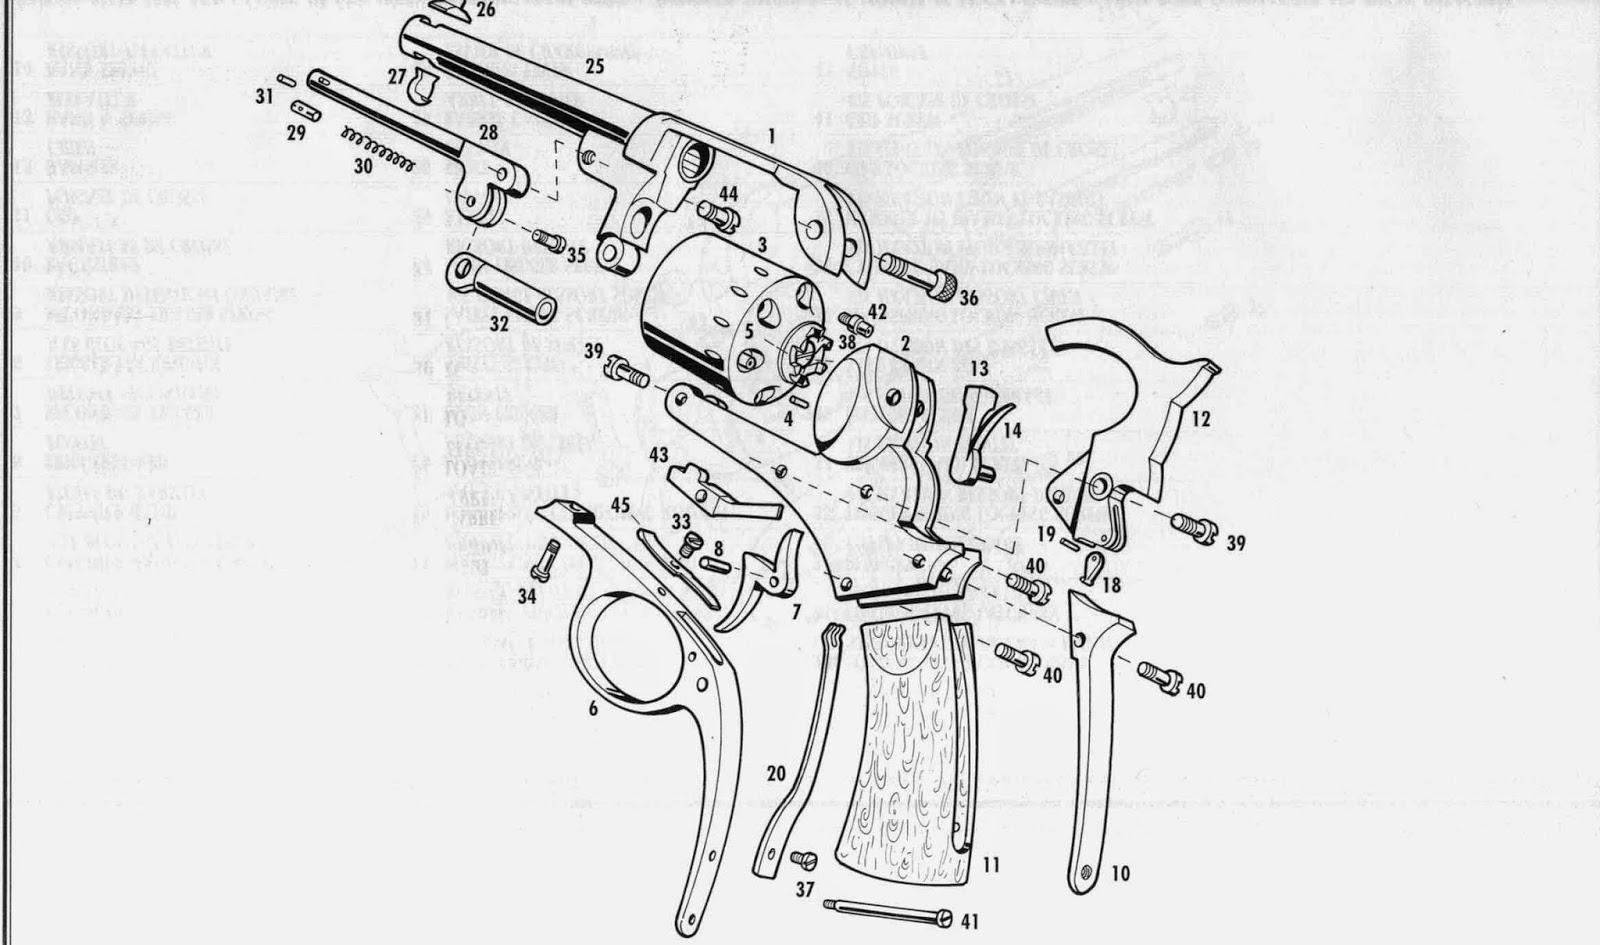 shéma 1863 starr single action